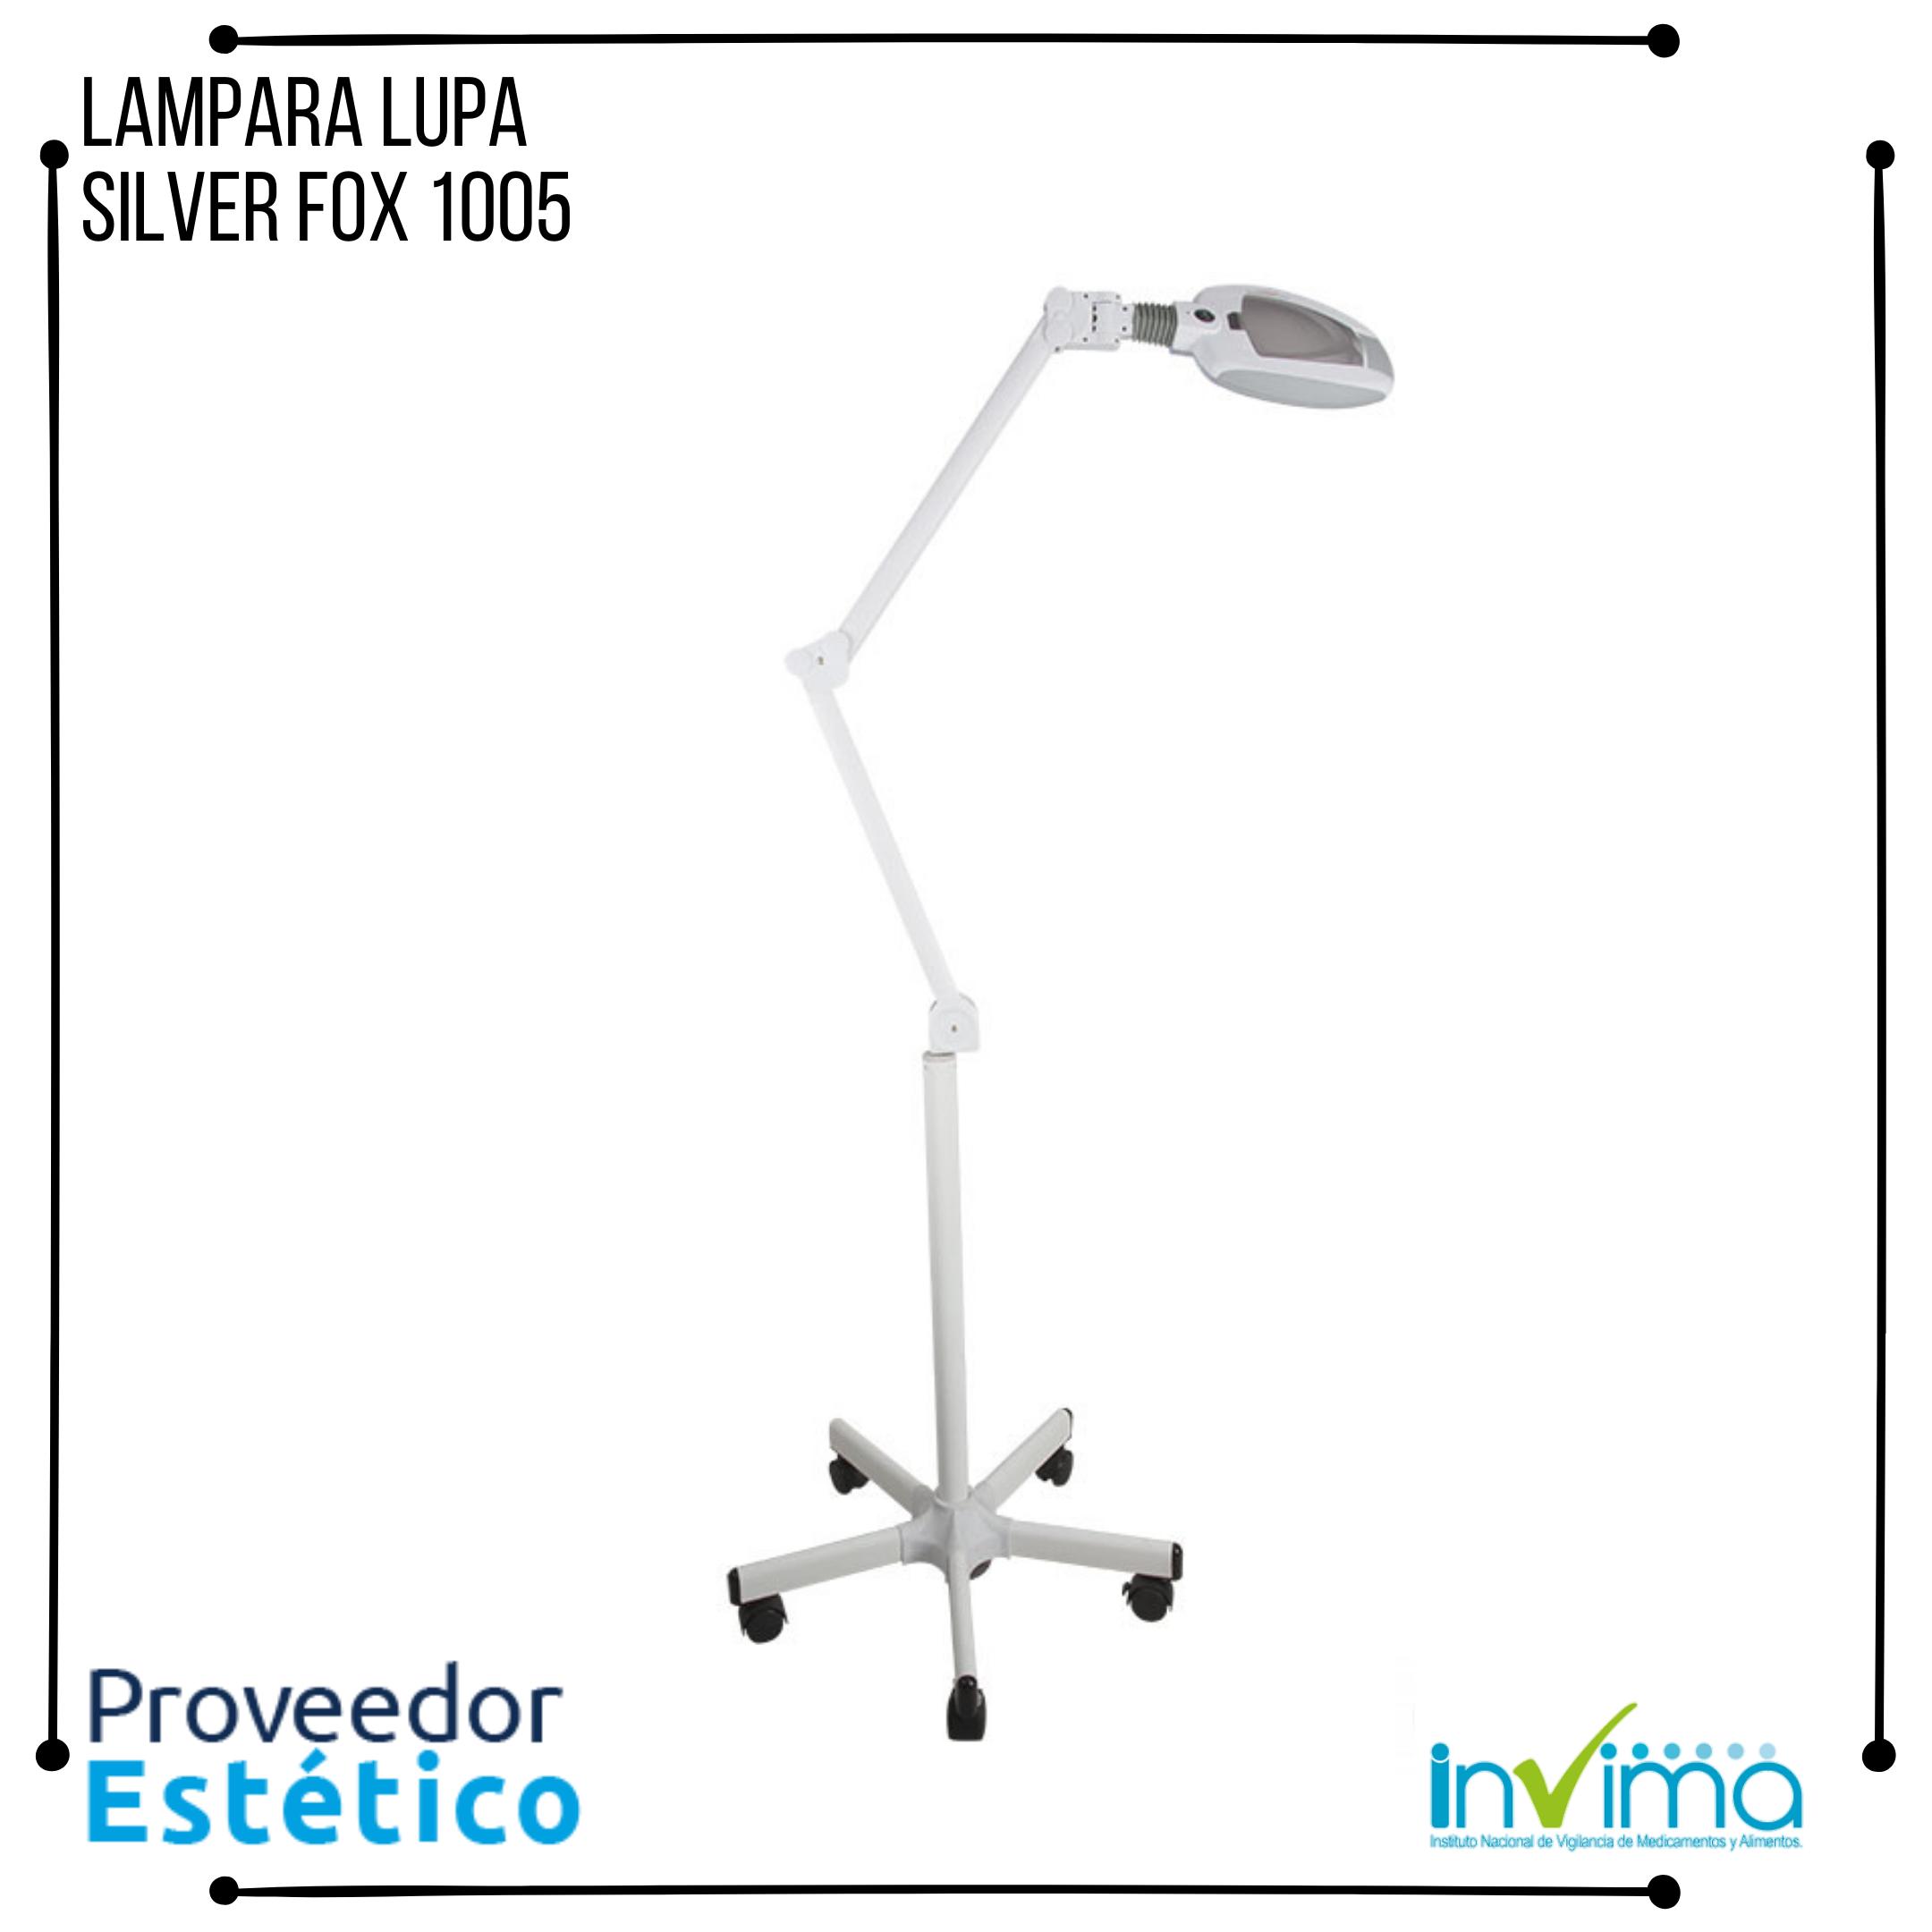 https://0201.nccdn.net/1_2/000/000/0ca/876/lampara-lupa-silver-fox-1005--1-.png